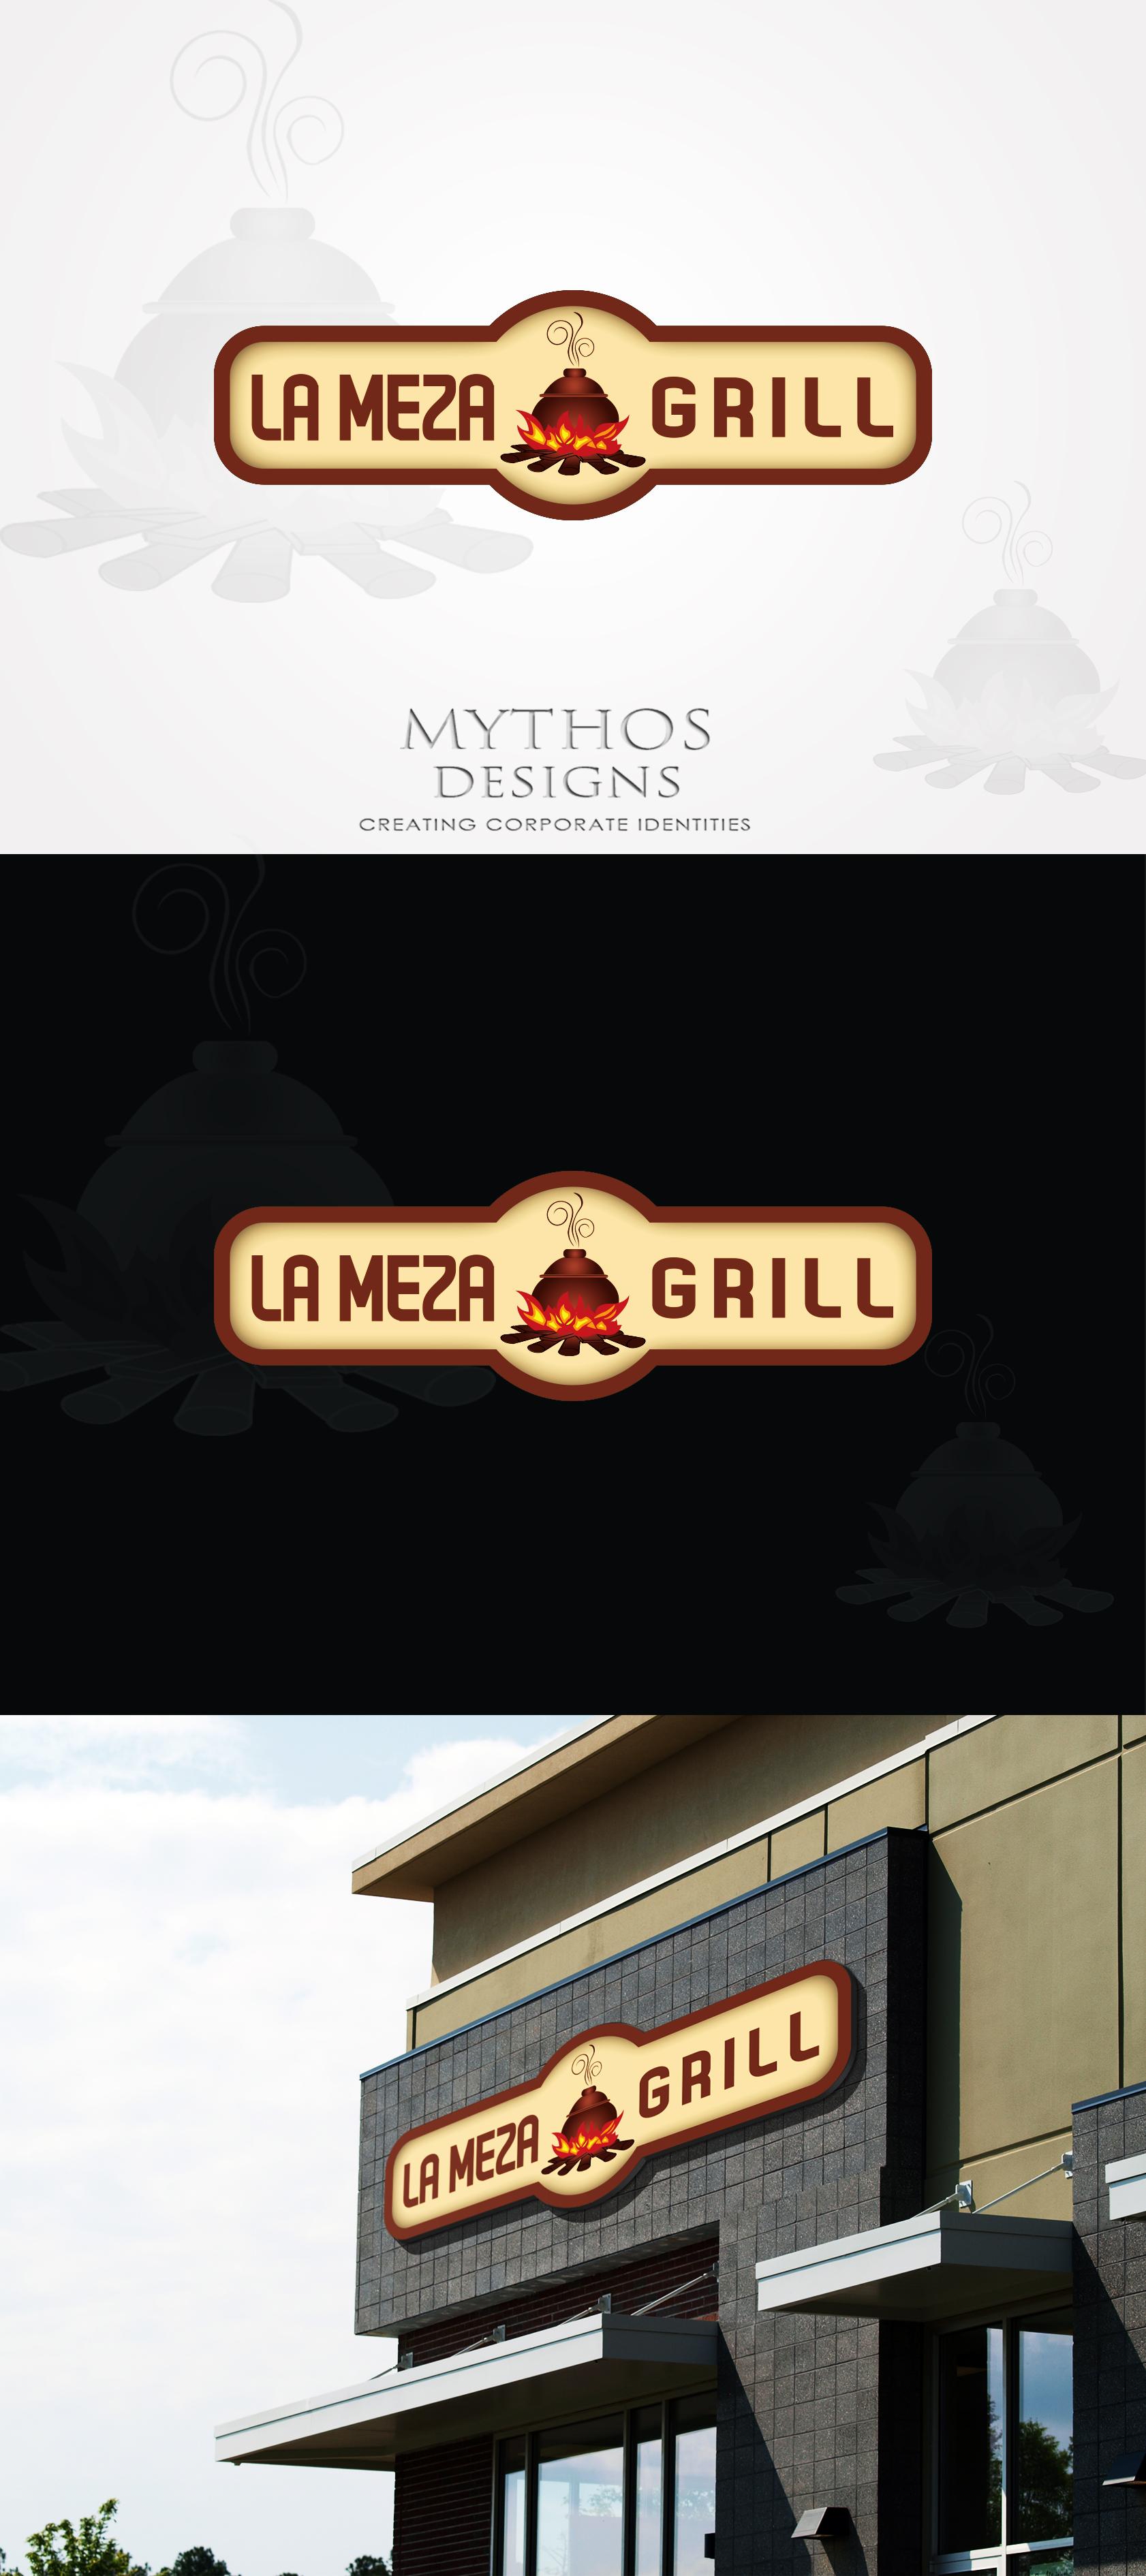 Logo Design by Mythos Designs - Entry No. 85 in the Logo Design Contest Inspiring Logo Design for La Meza Grill Ltd..